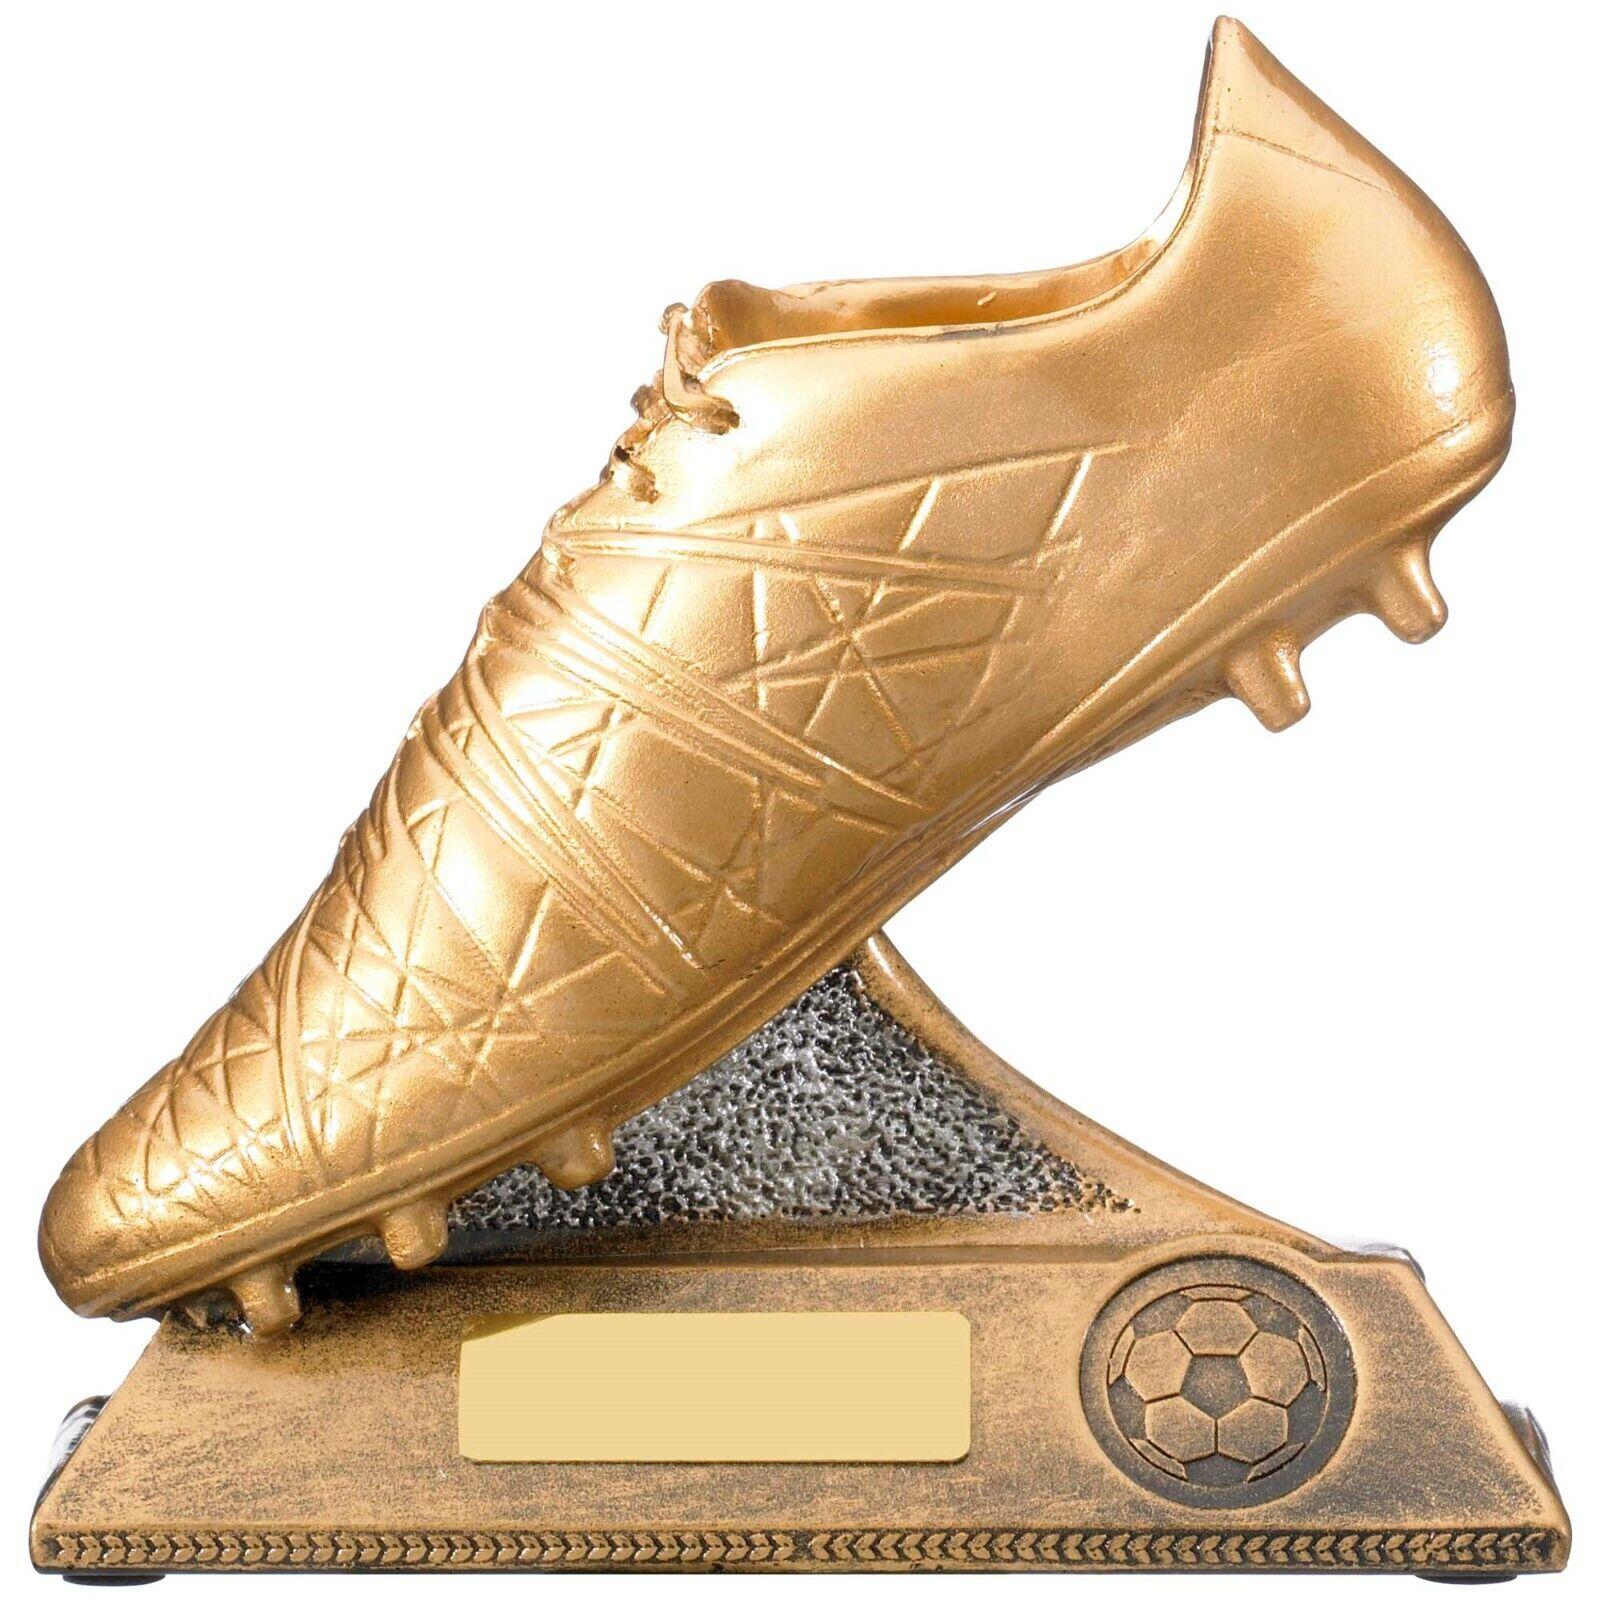 dbc766ccf Stunning Stunning Stunning Football Trophy football golden Boot Award FREE  Engraving RF526 e87c5d